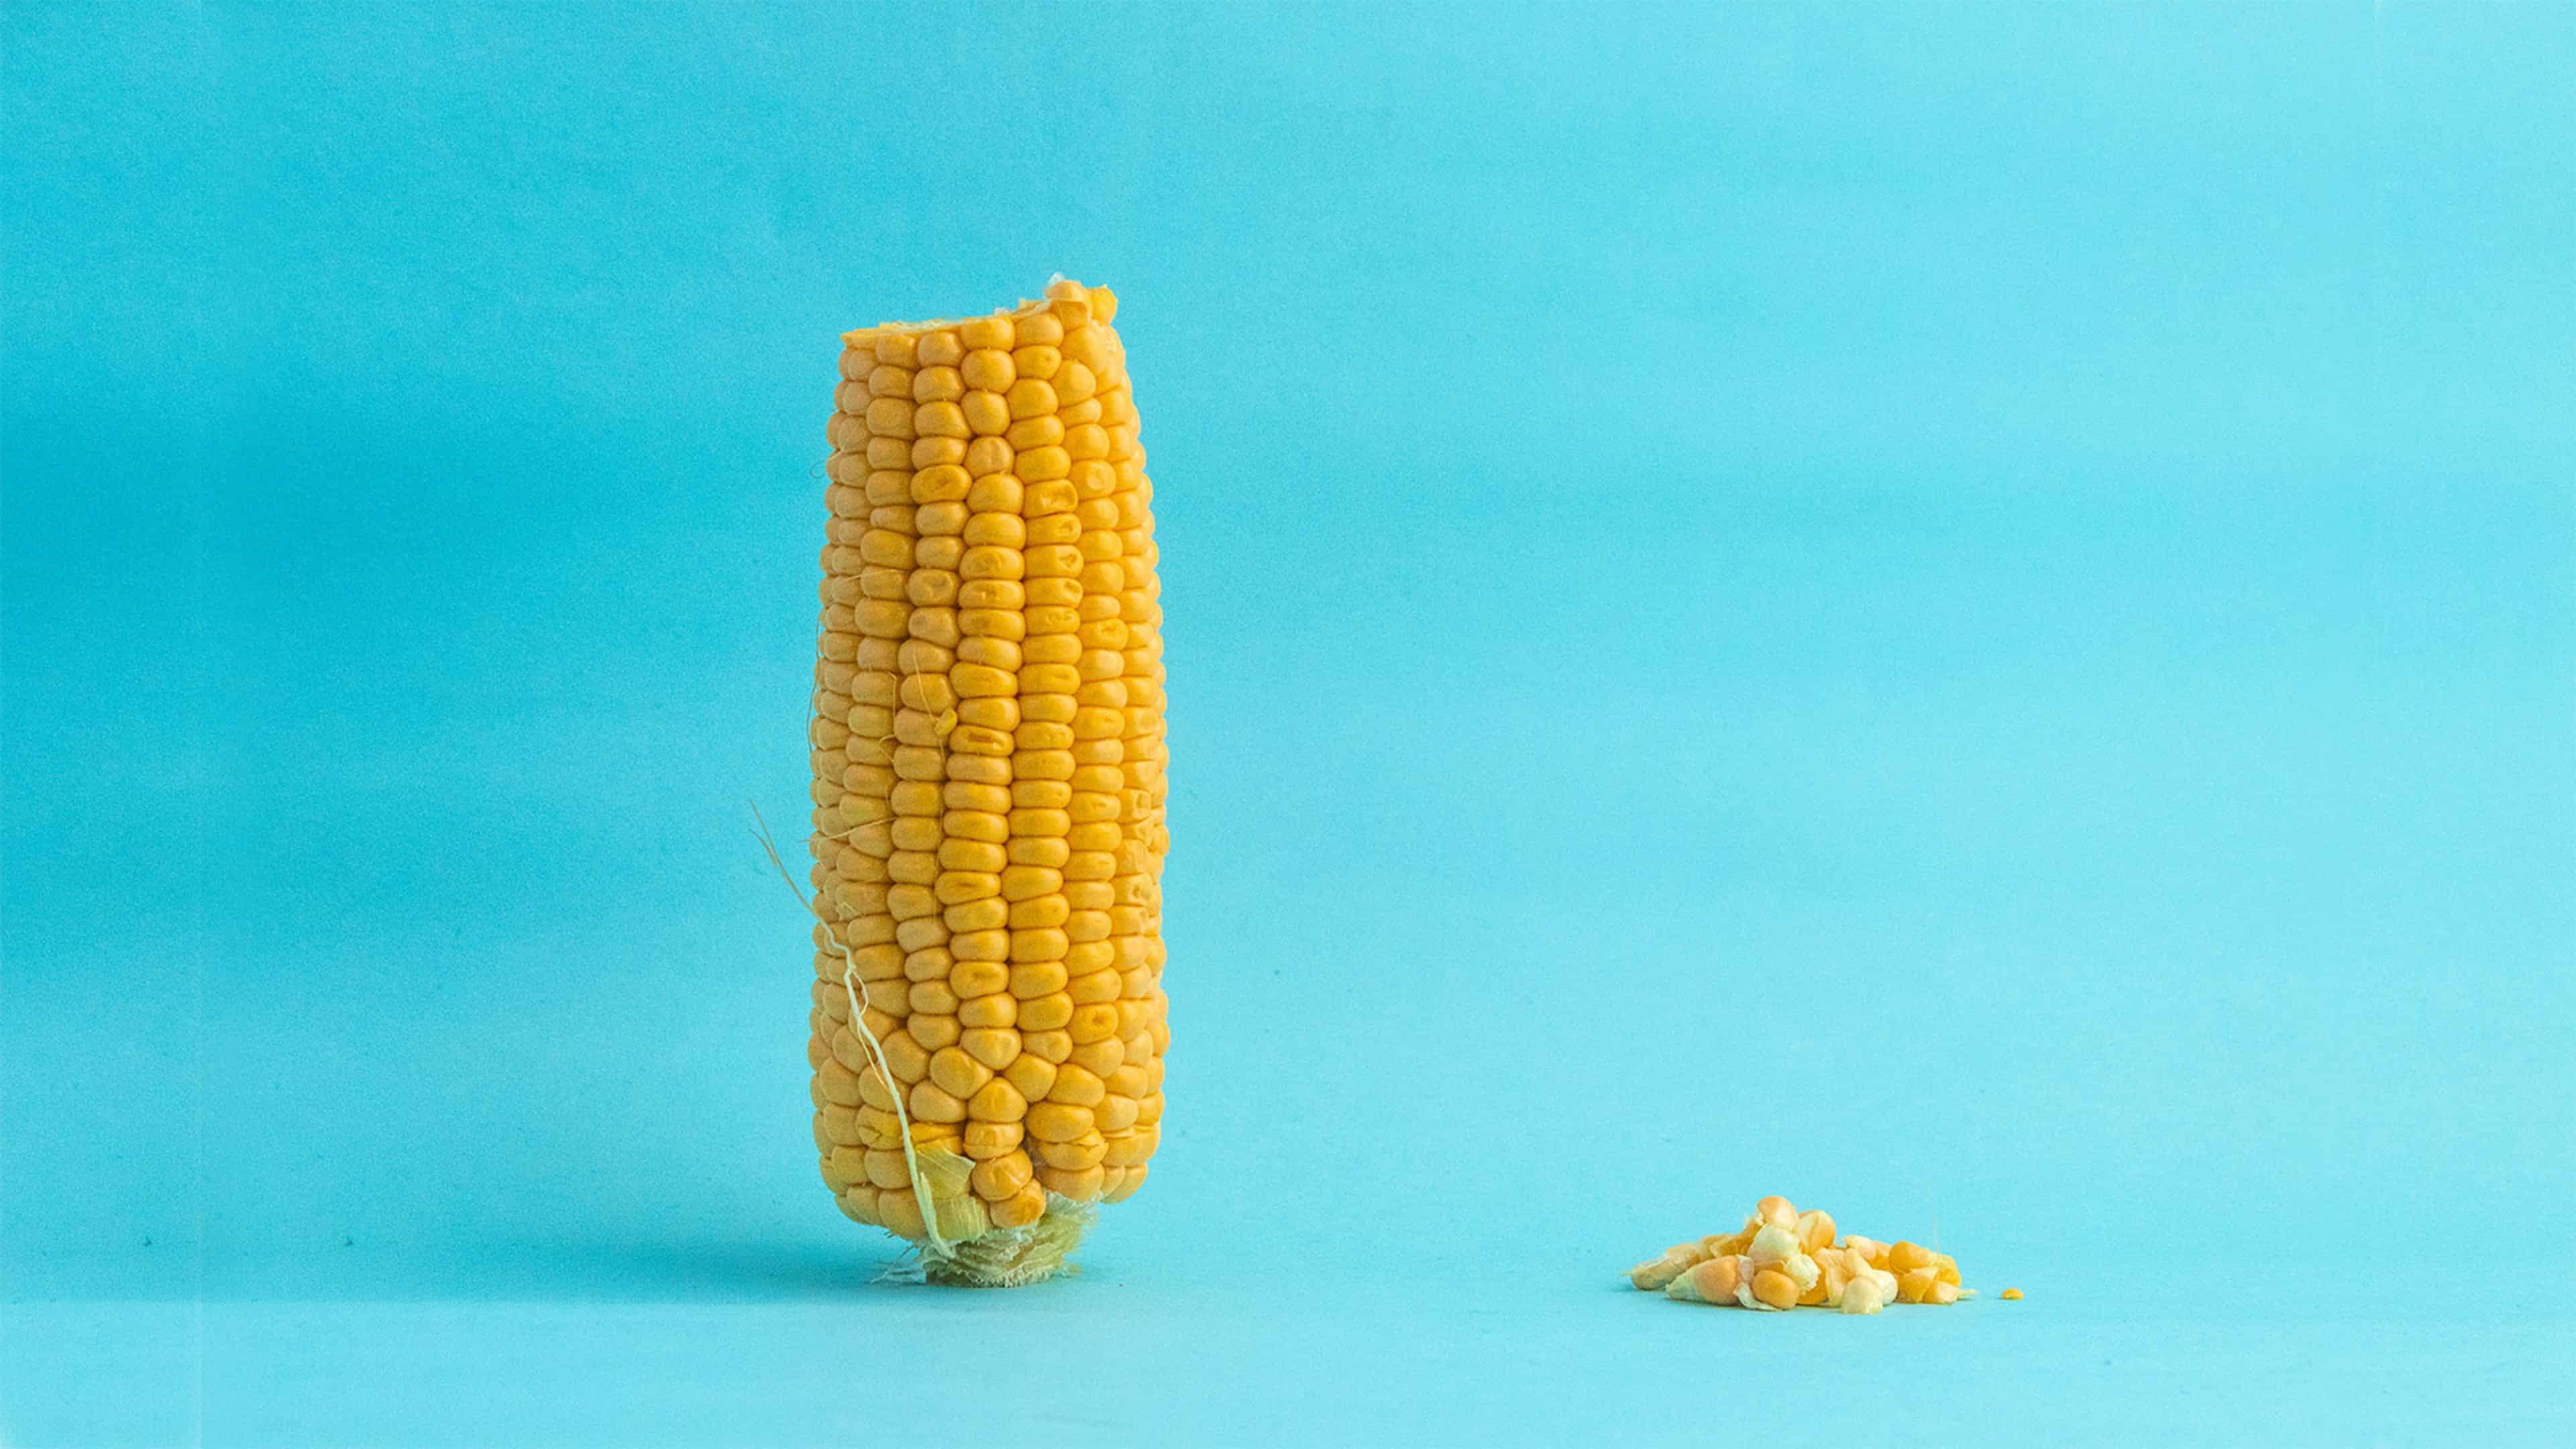 corn, corn kernels, corn facts